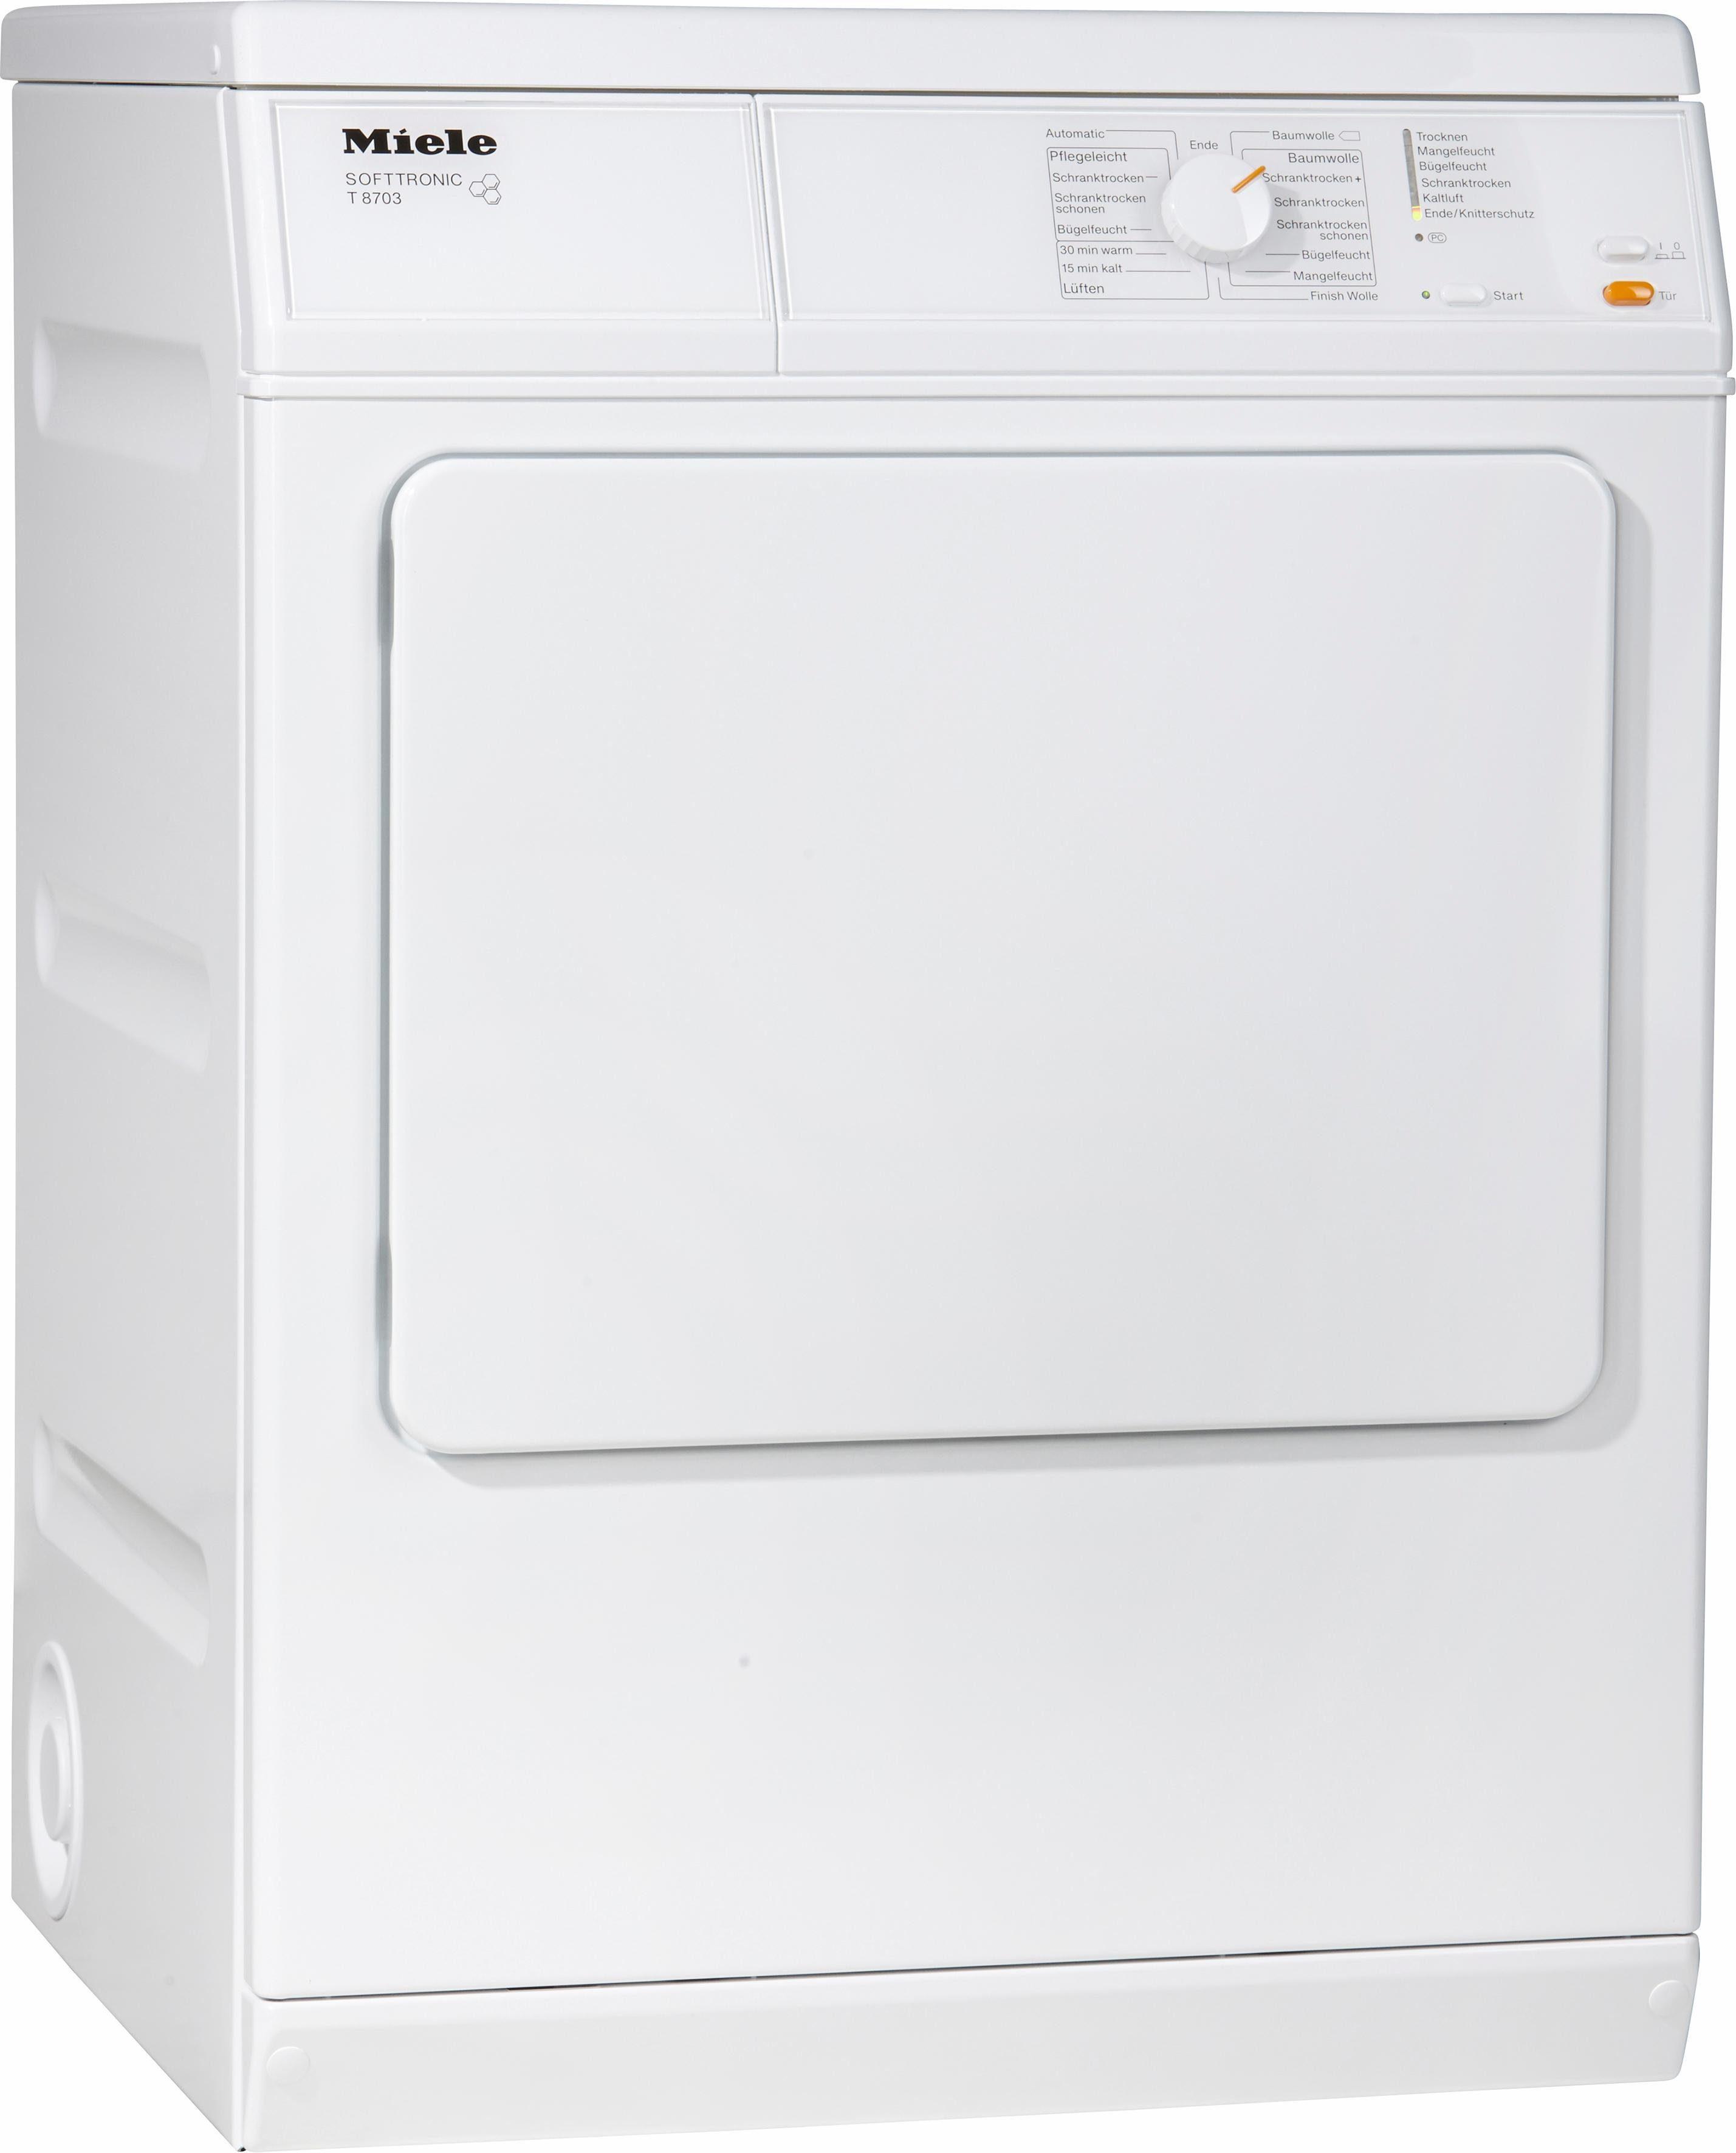 Miele Ablufttrockner T 8703, 7 kg